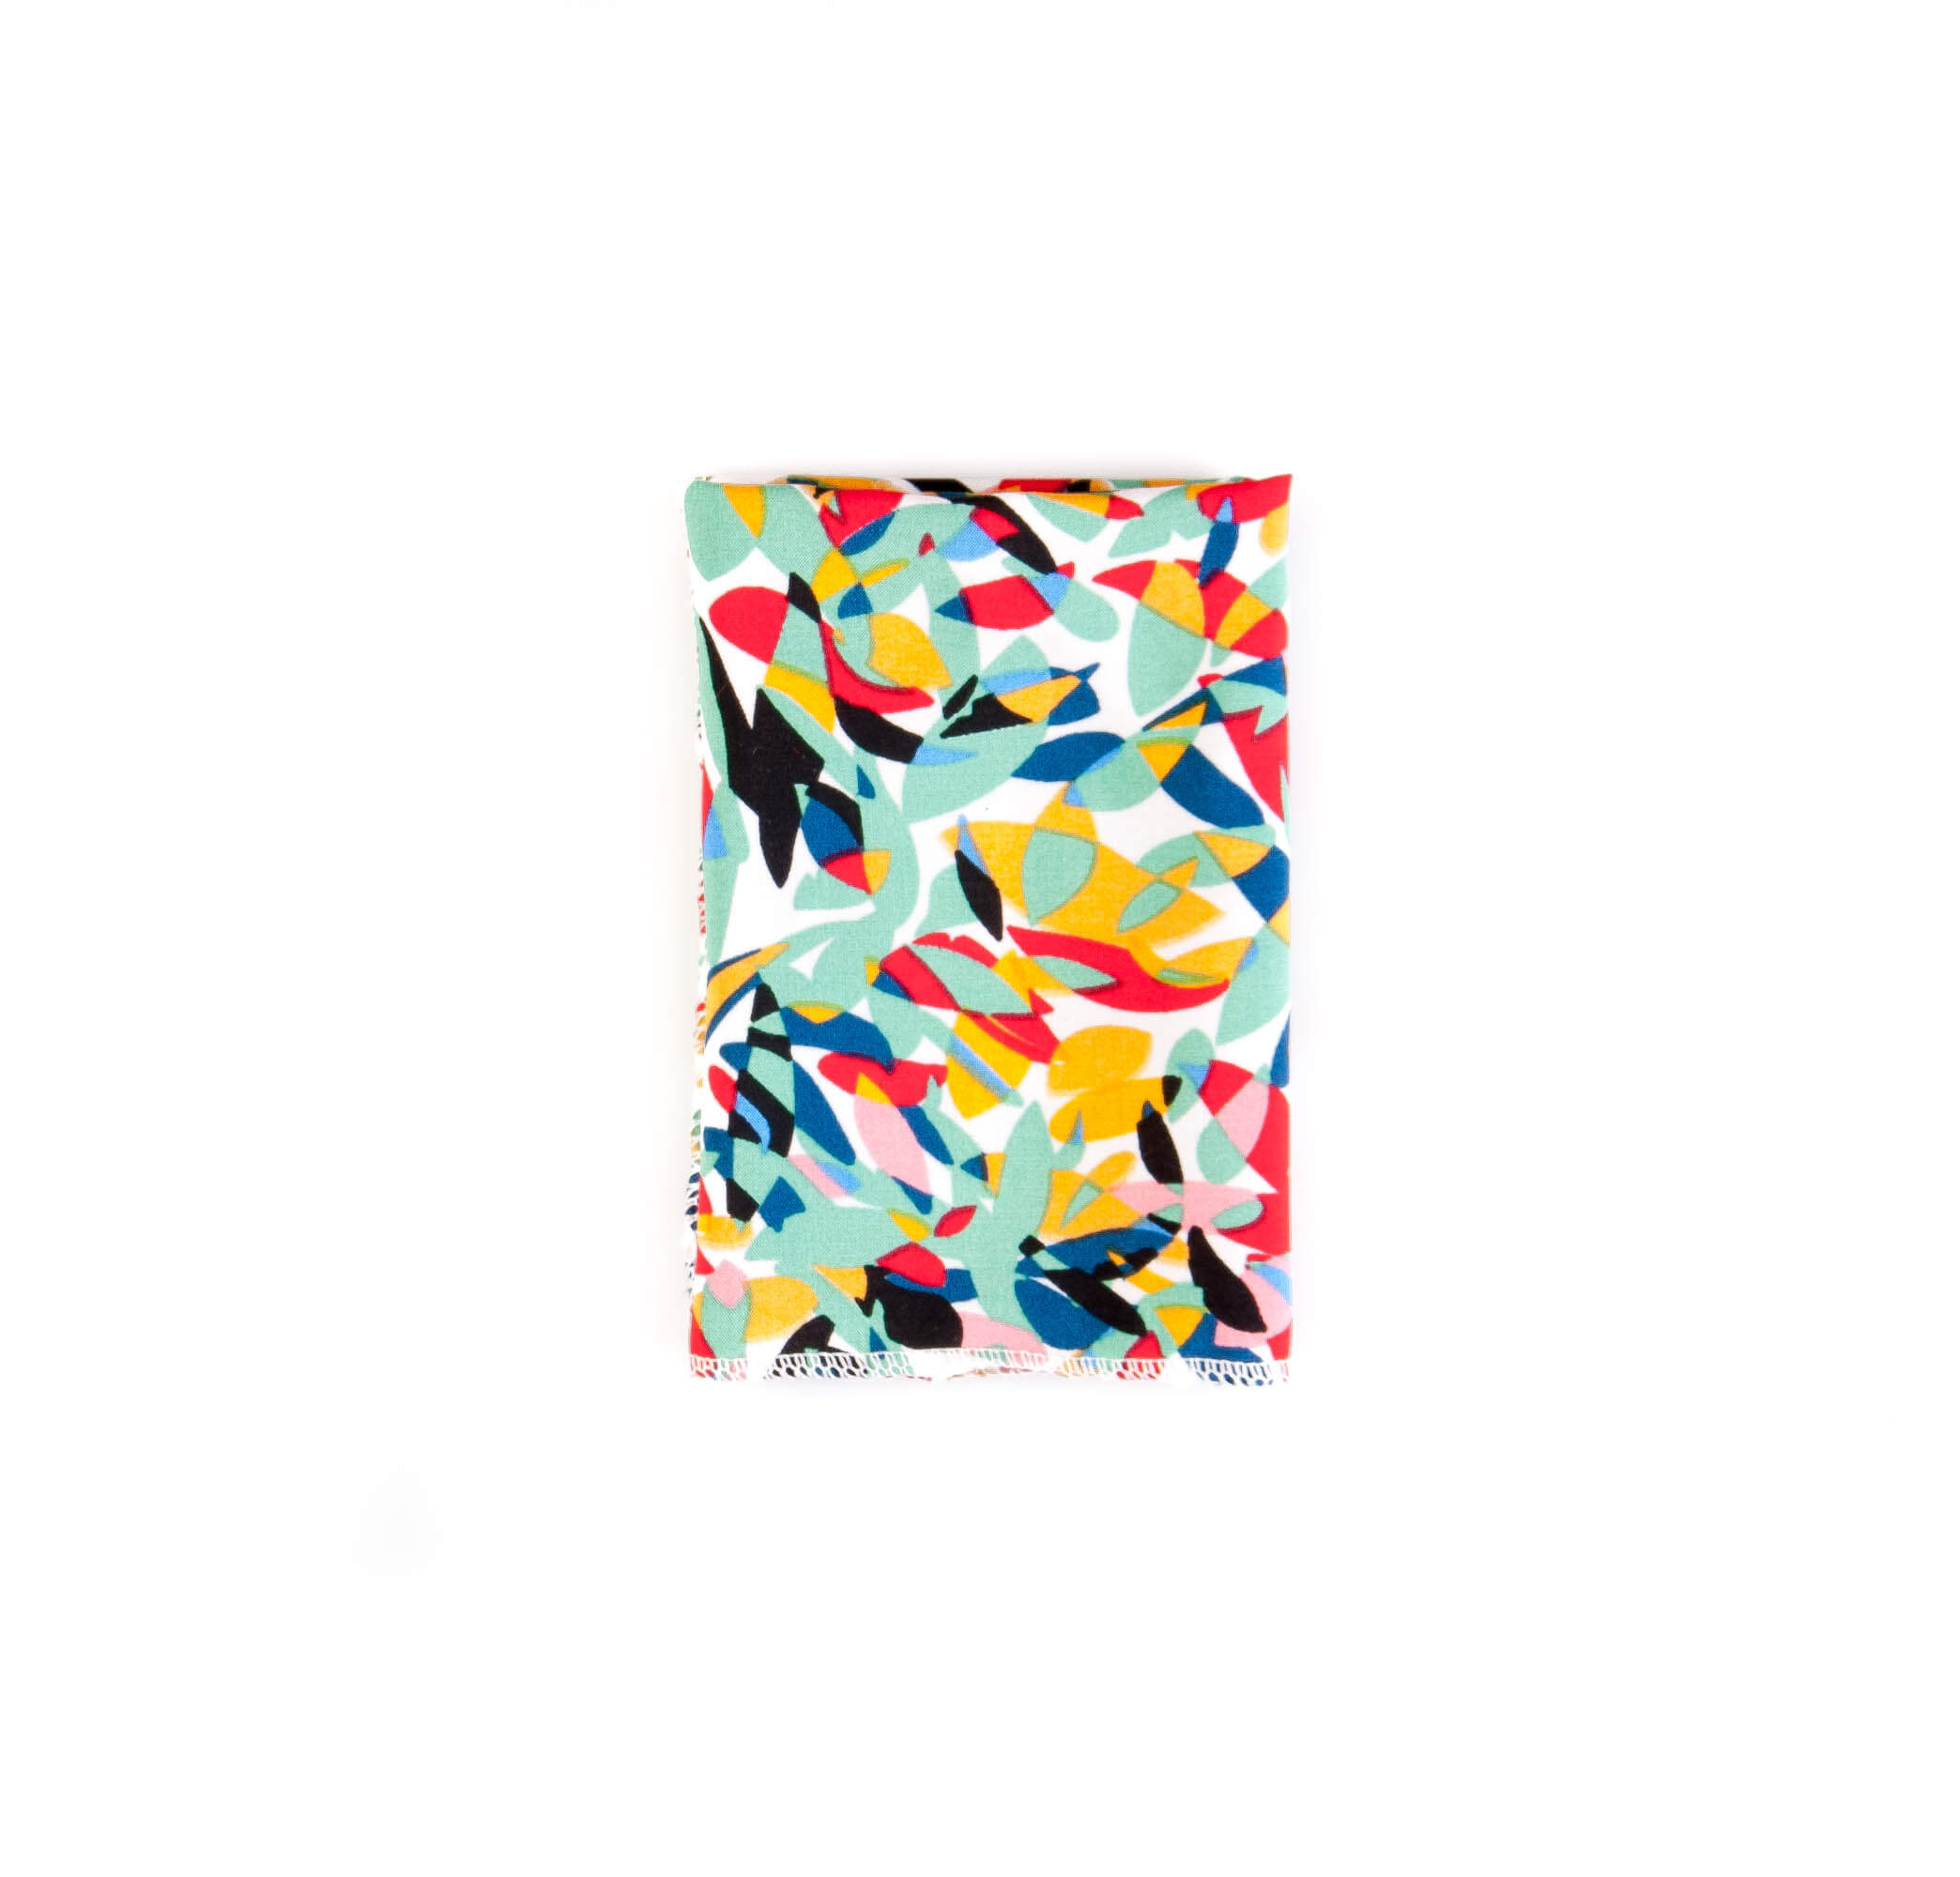 دستمال جیب طرح مدرن رنگی کد PS1052